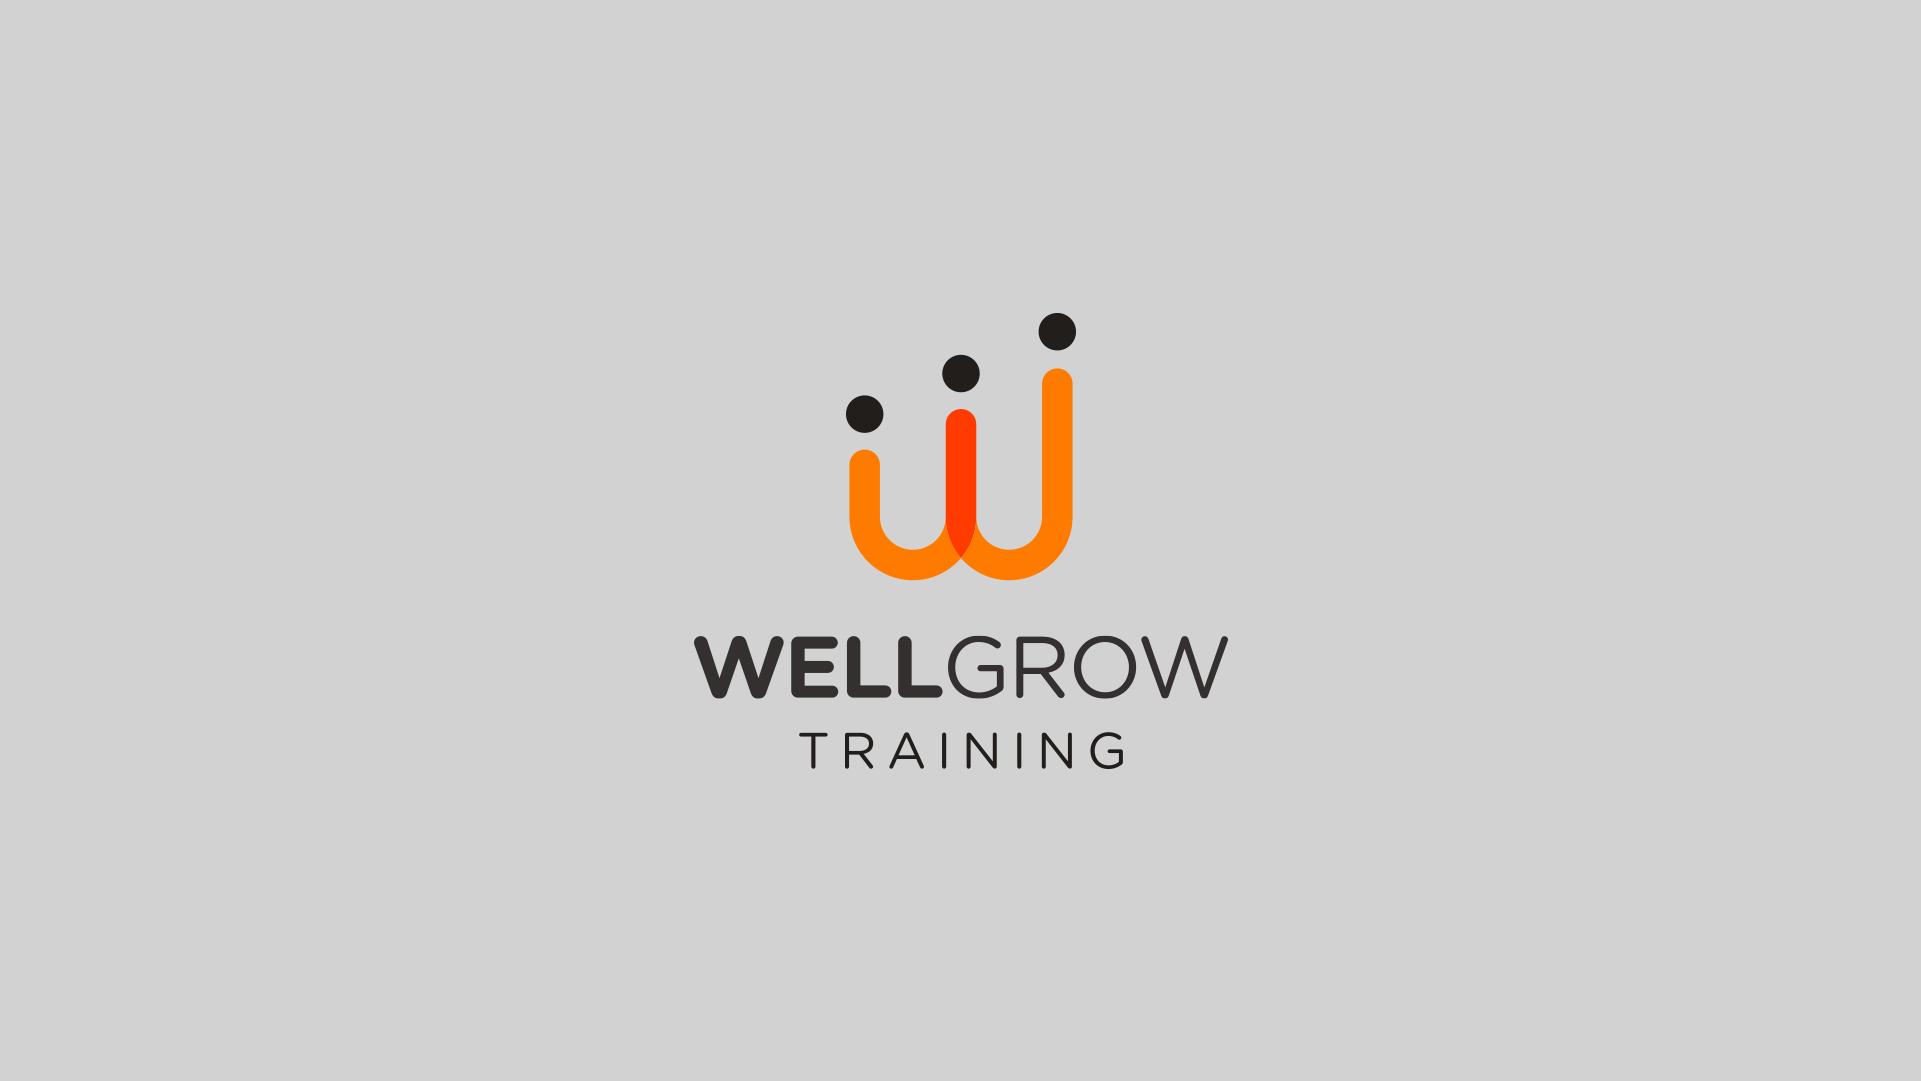 WellGrow Training